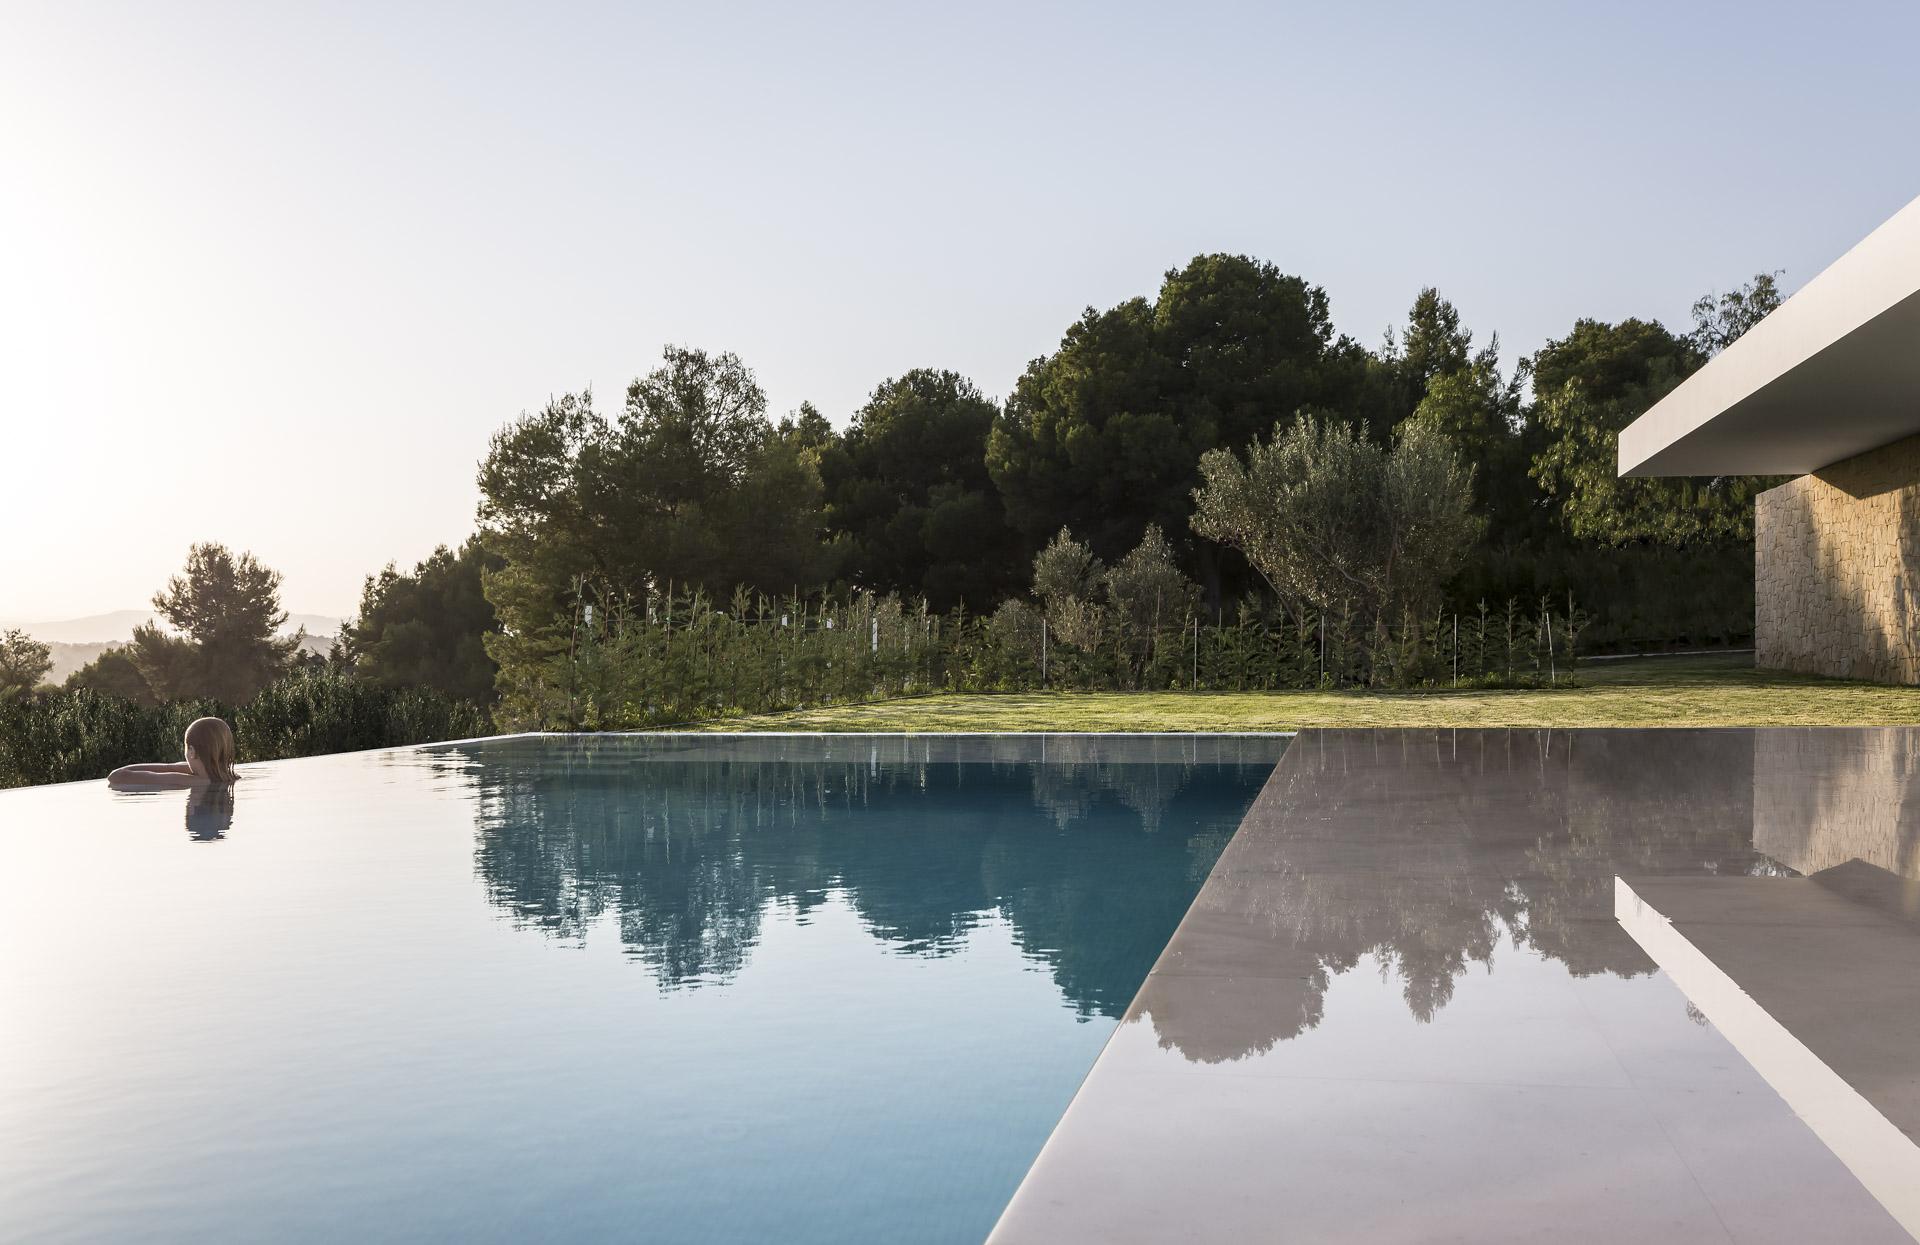 fotografia-arquitectura-valencia-german-cabo-gallardo-llopis-villamarchante-vivienda-48